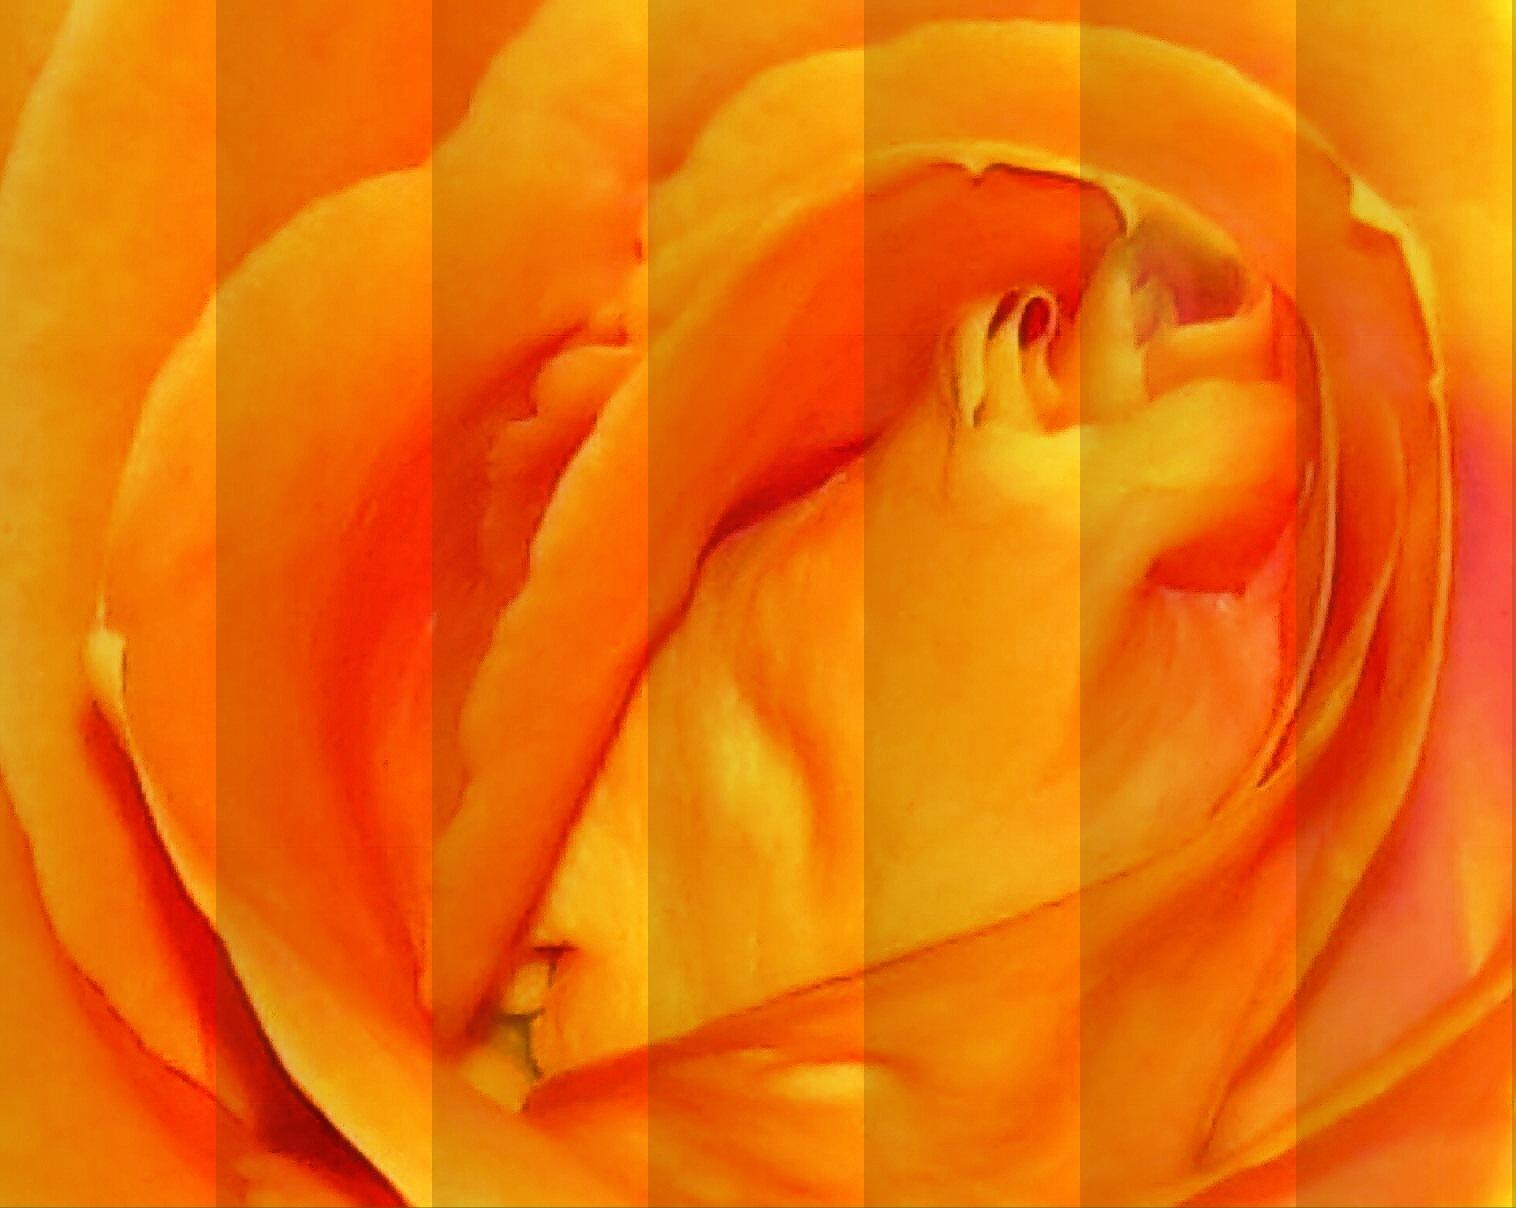 Orange Rose with Blinds by bellamahri